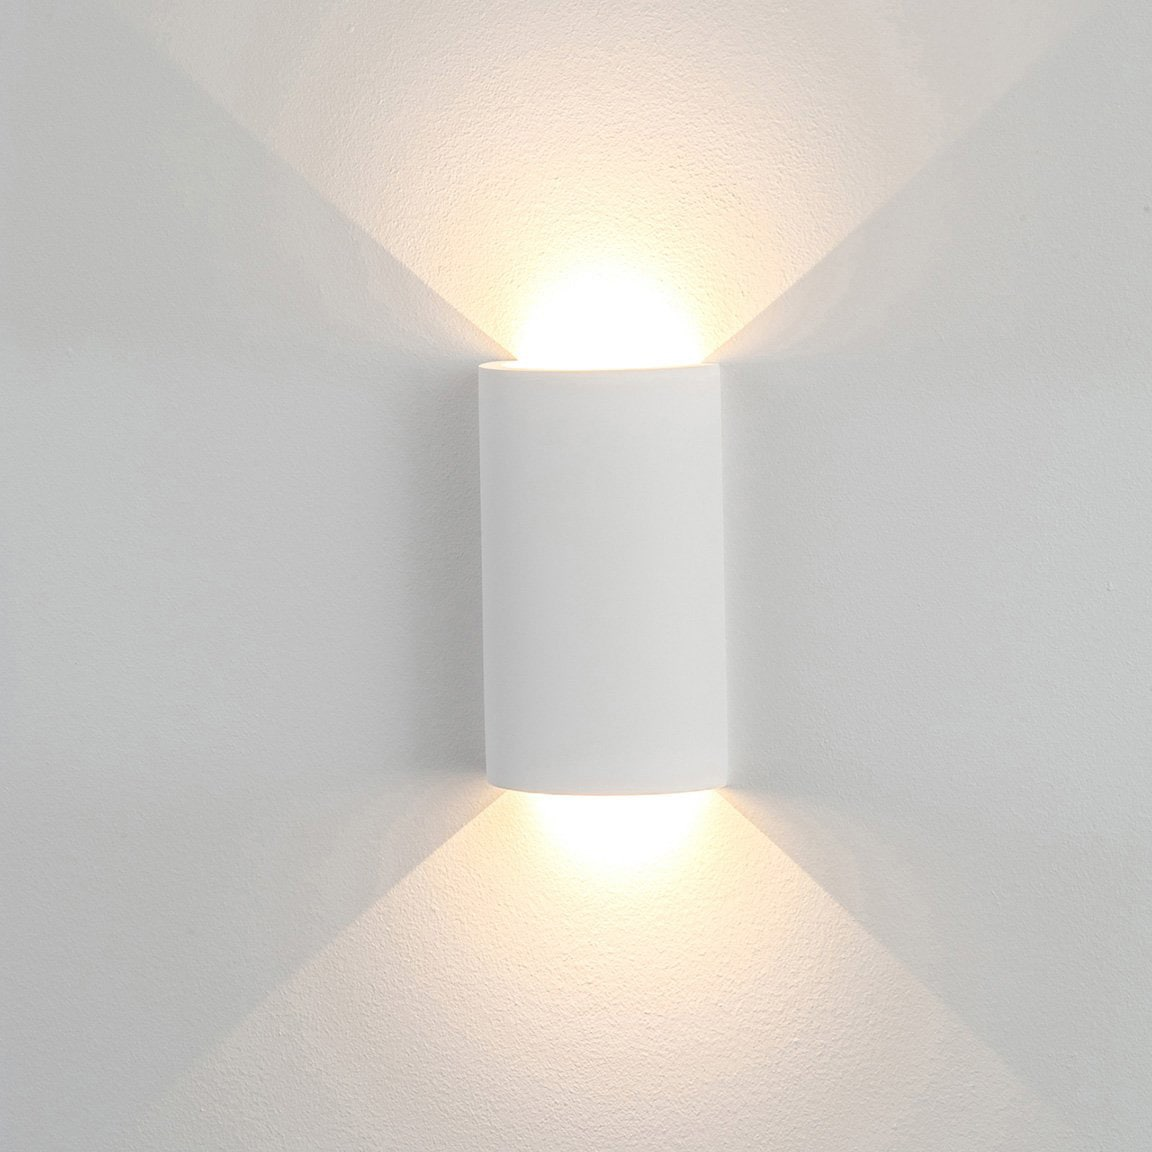 Havit Lighting LED Wandleuchte GALLERY, 1 St.